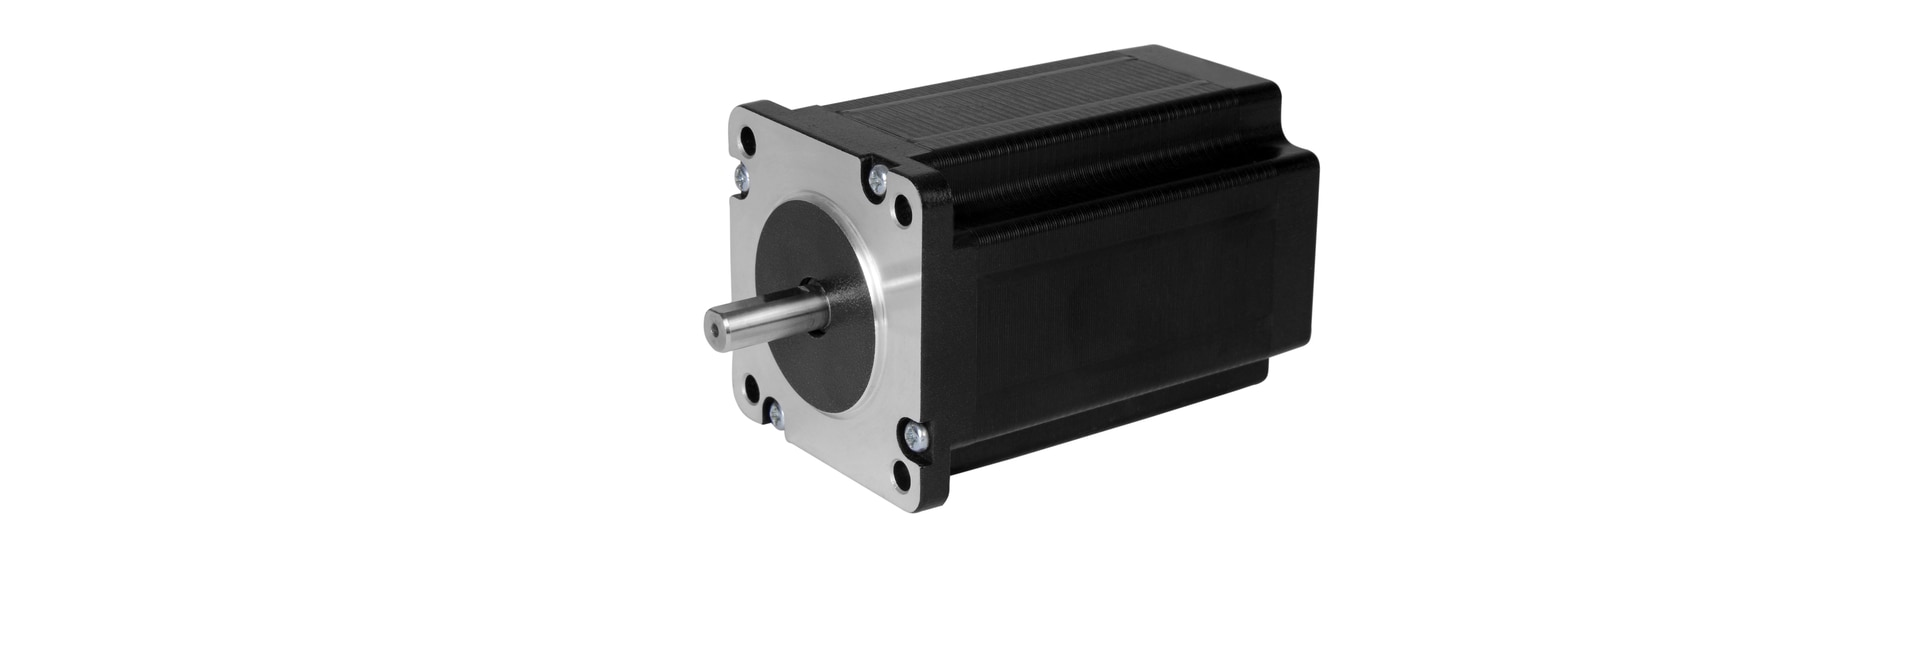 Three phase stepper motor apply to lighting system